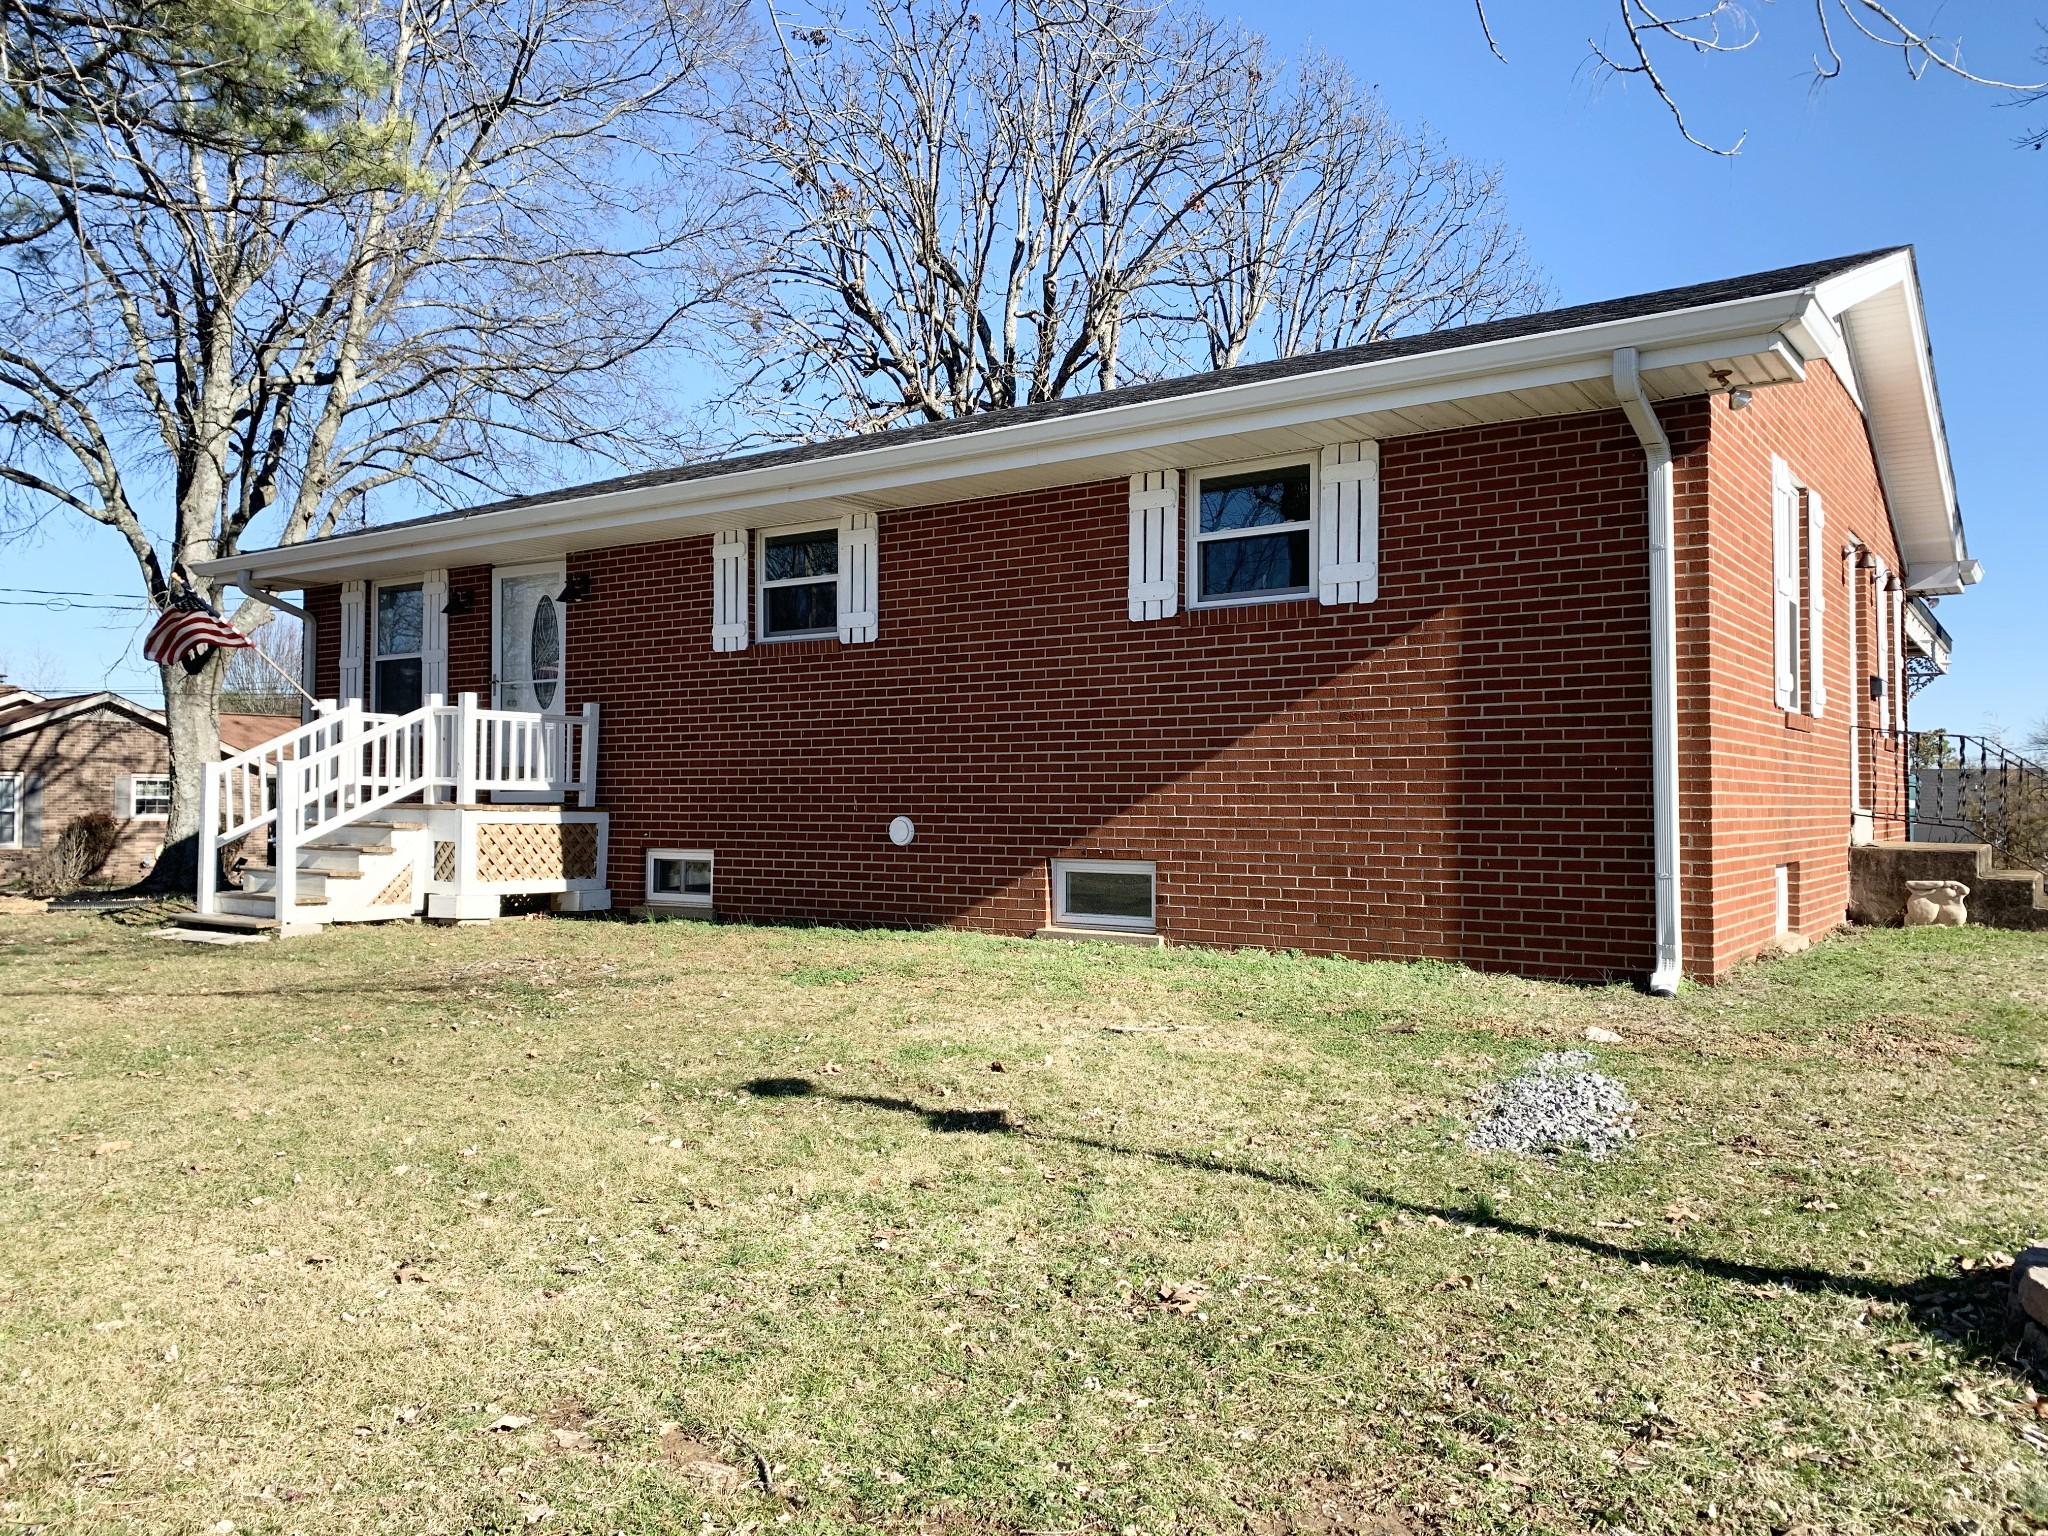 209 Maple Hill Rd, Lebanon, TN 37087 - Lebanon, TN real estate listing